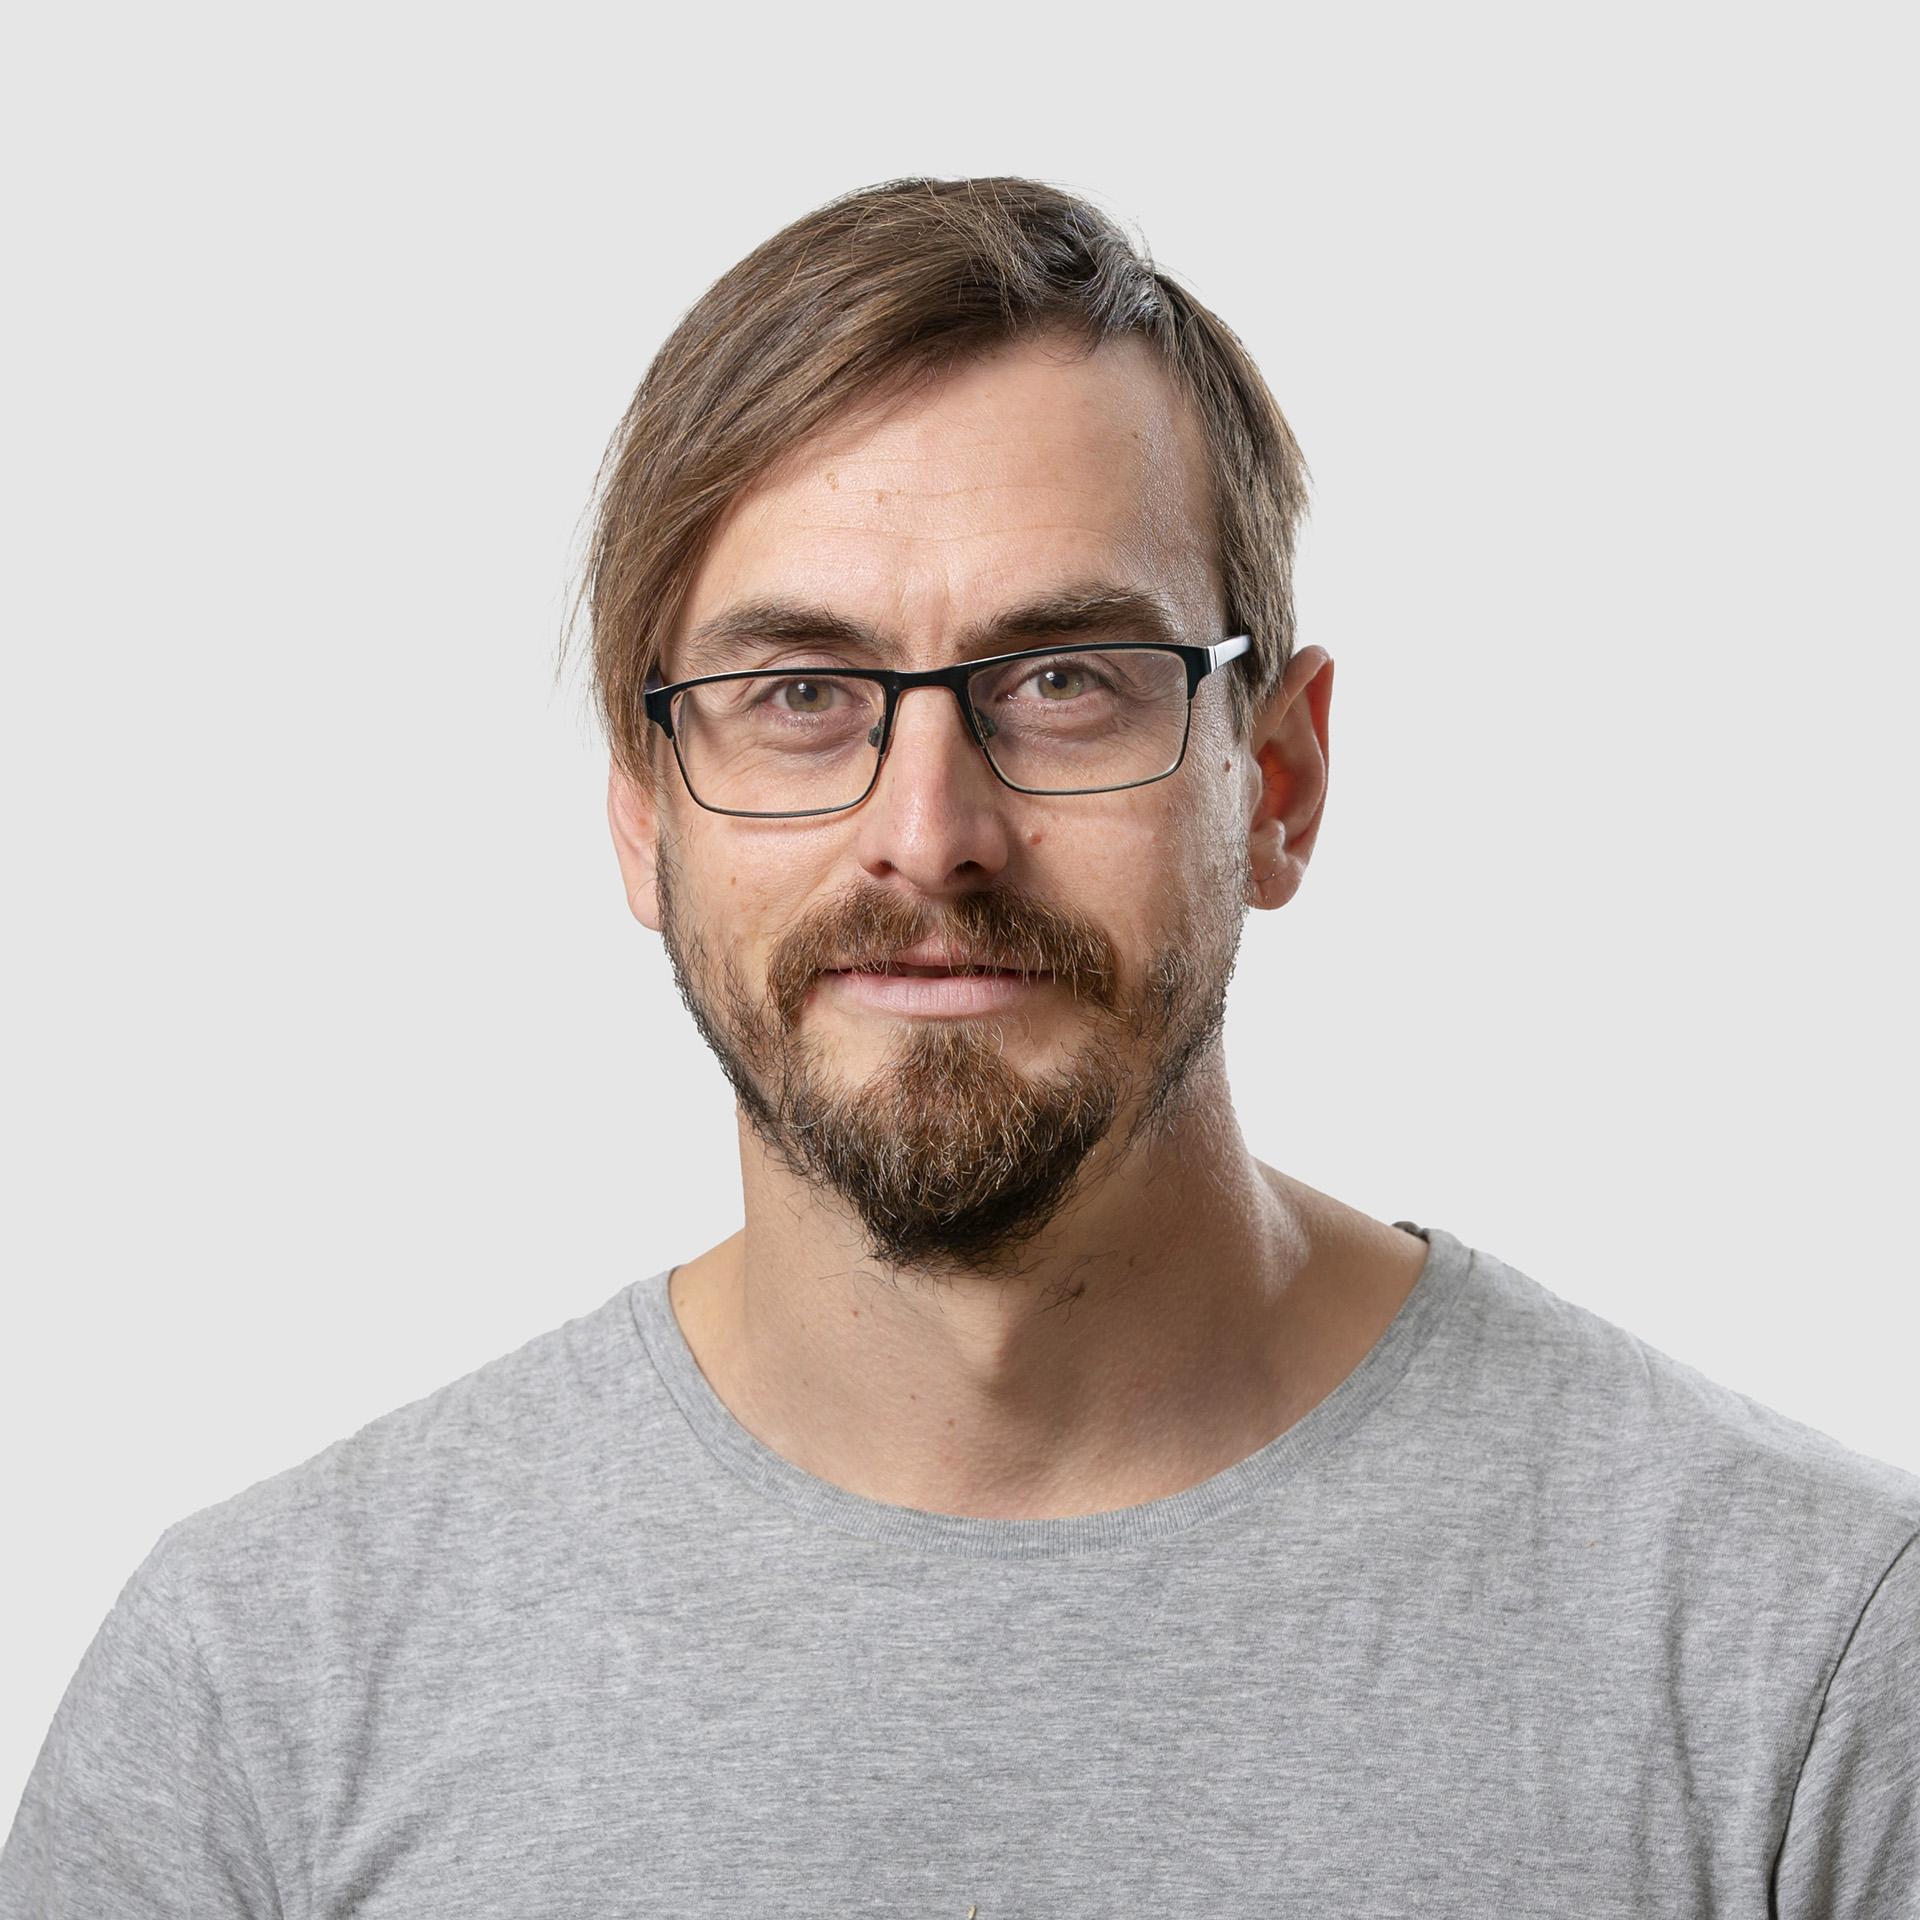 David Åslund